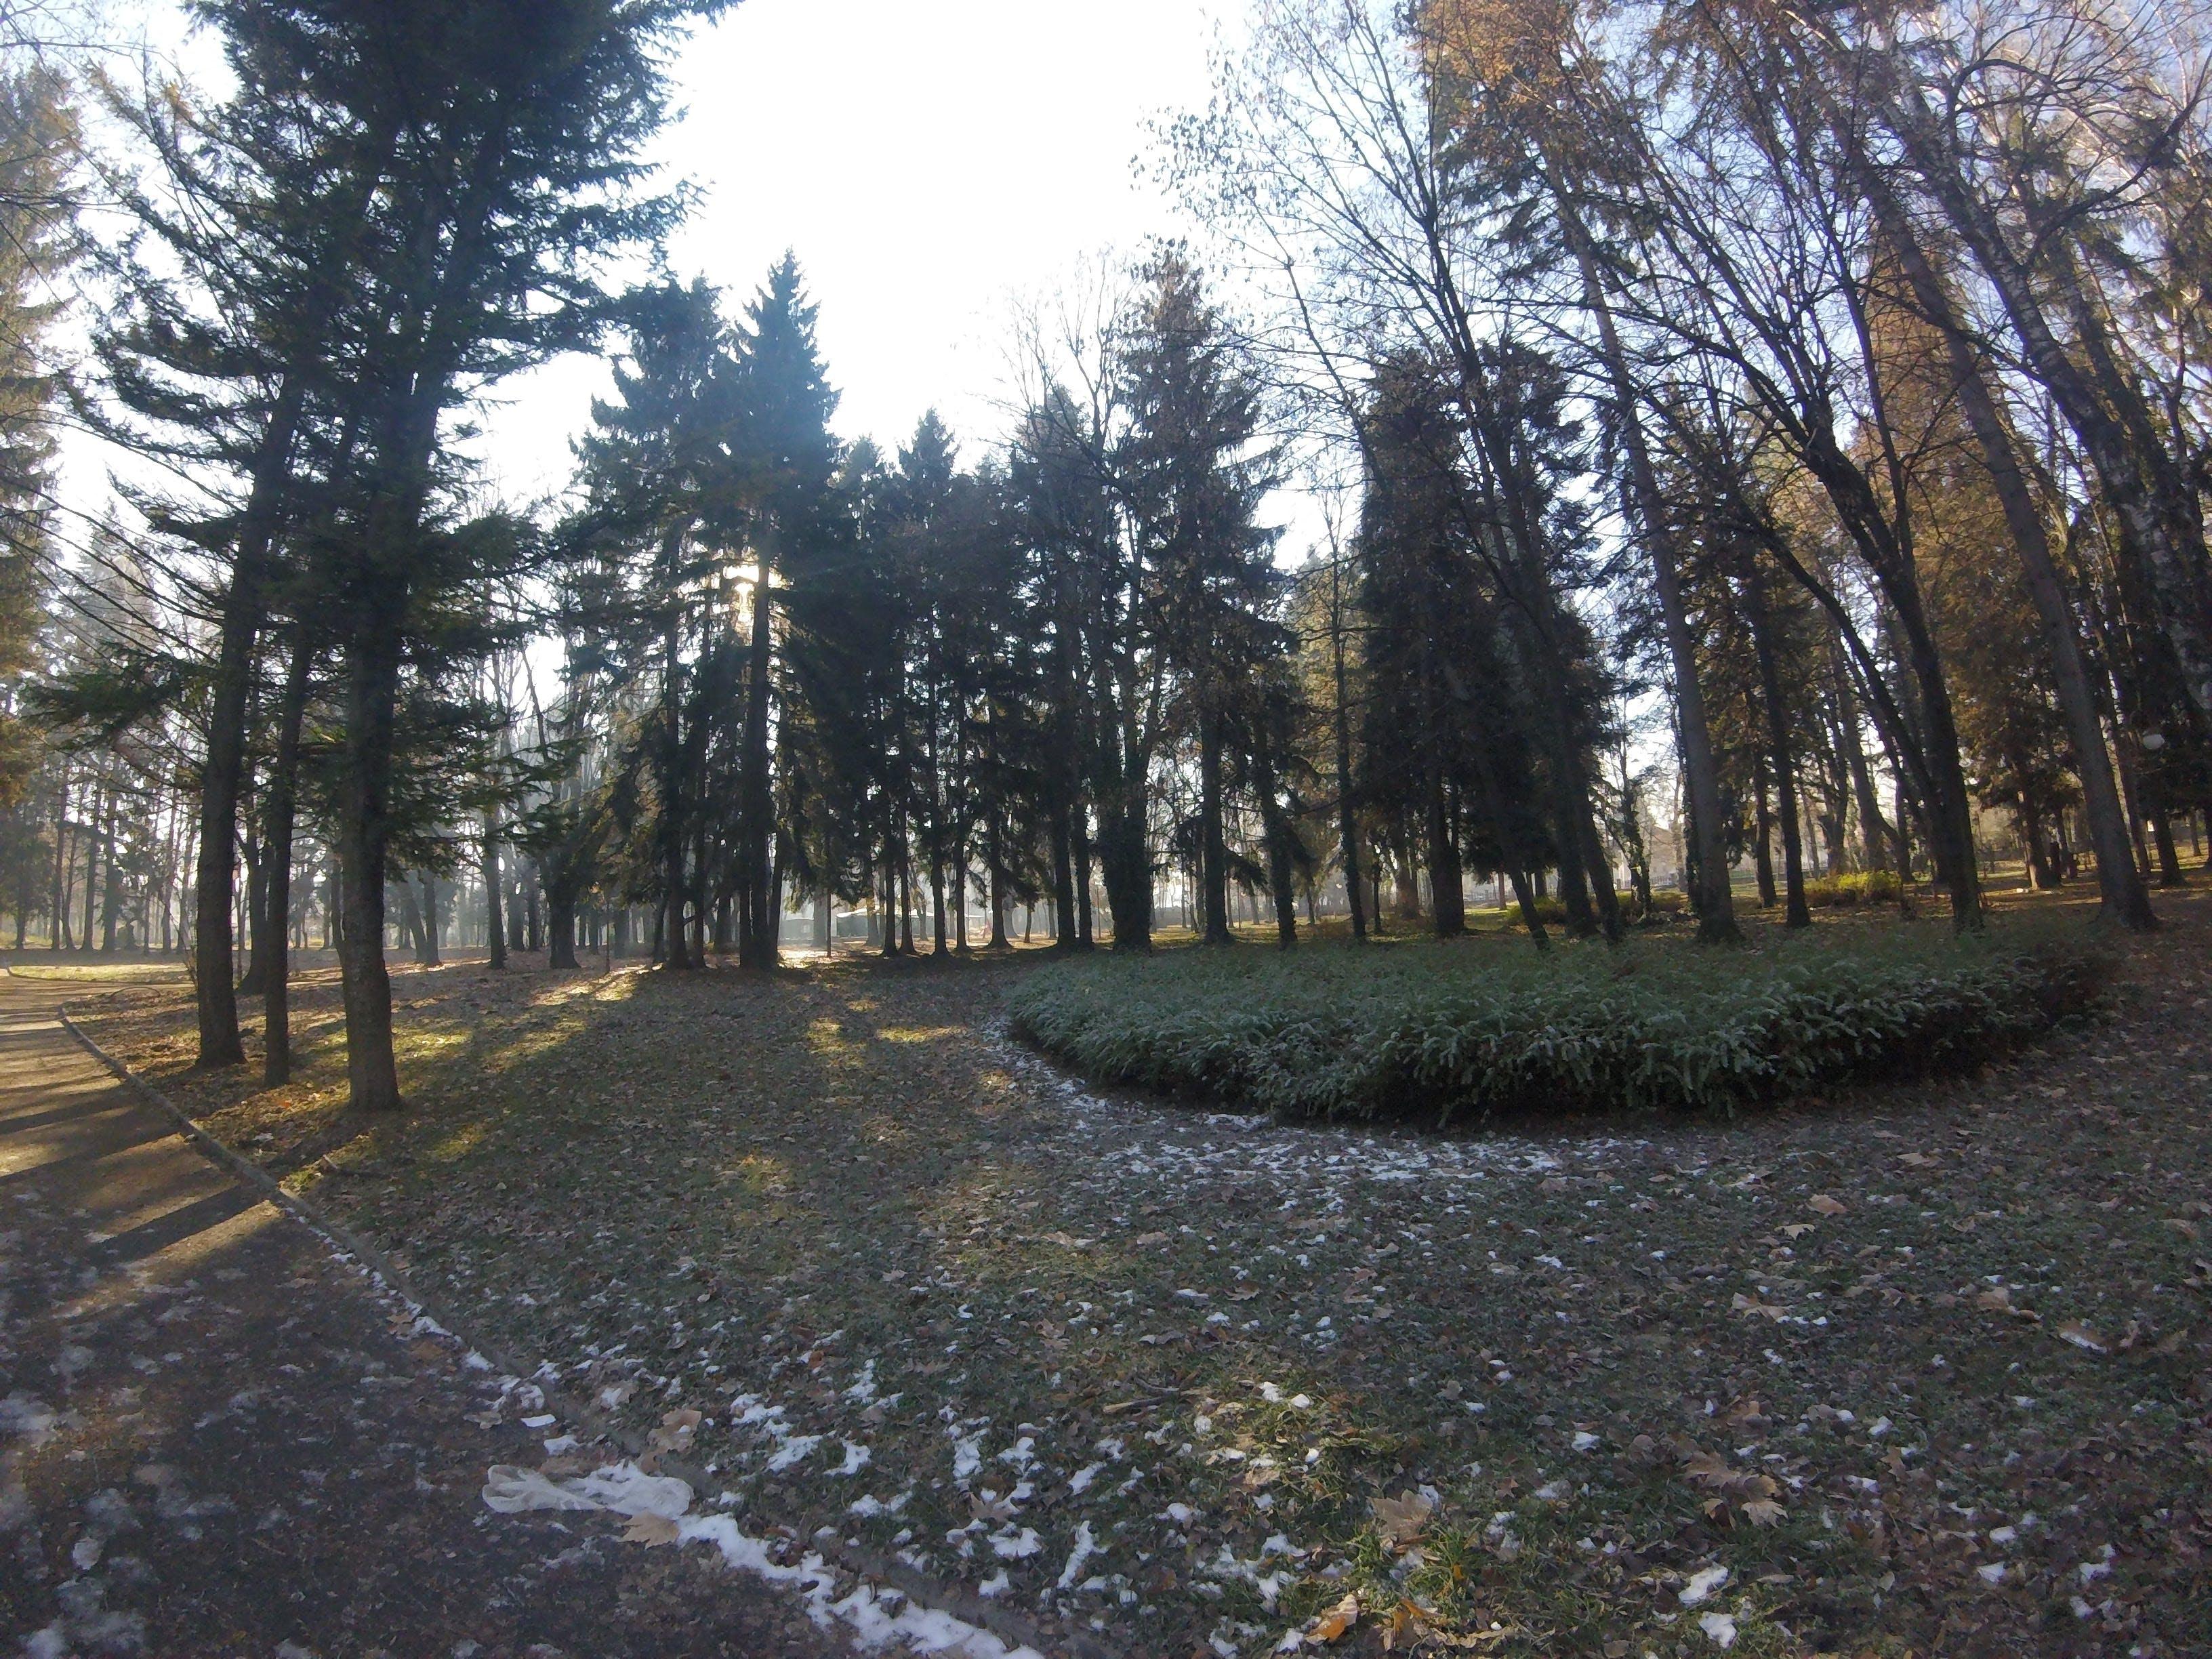 Free stock photo of walk through a park